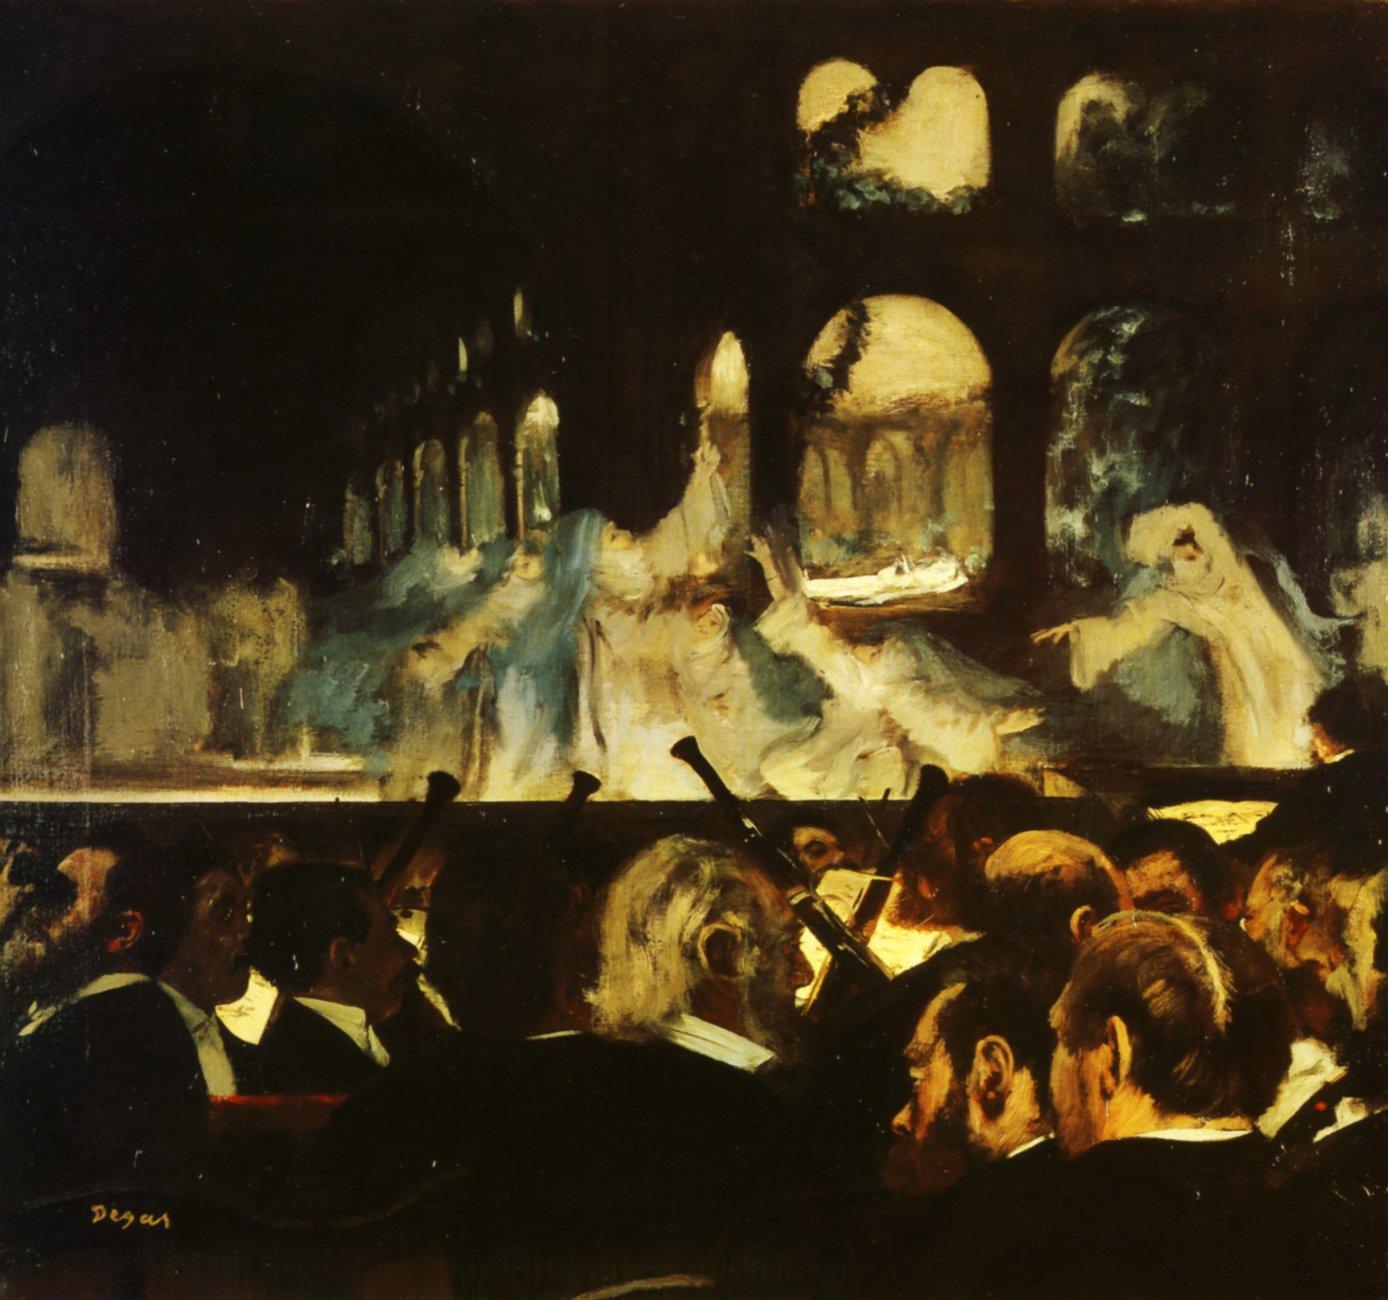 ballet-scene-from-robert-la-diable-1872.jpg